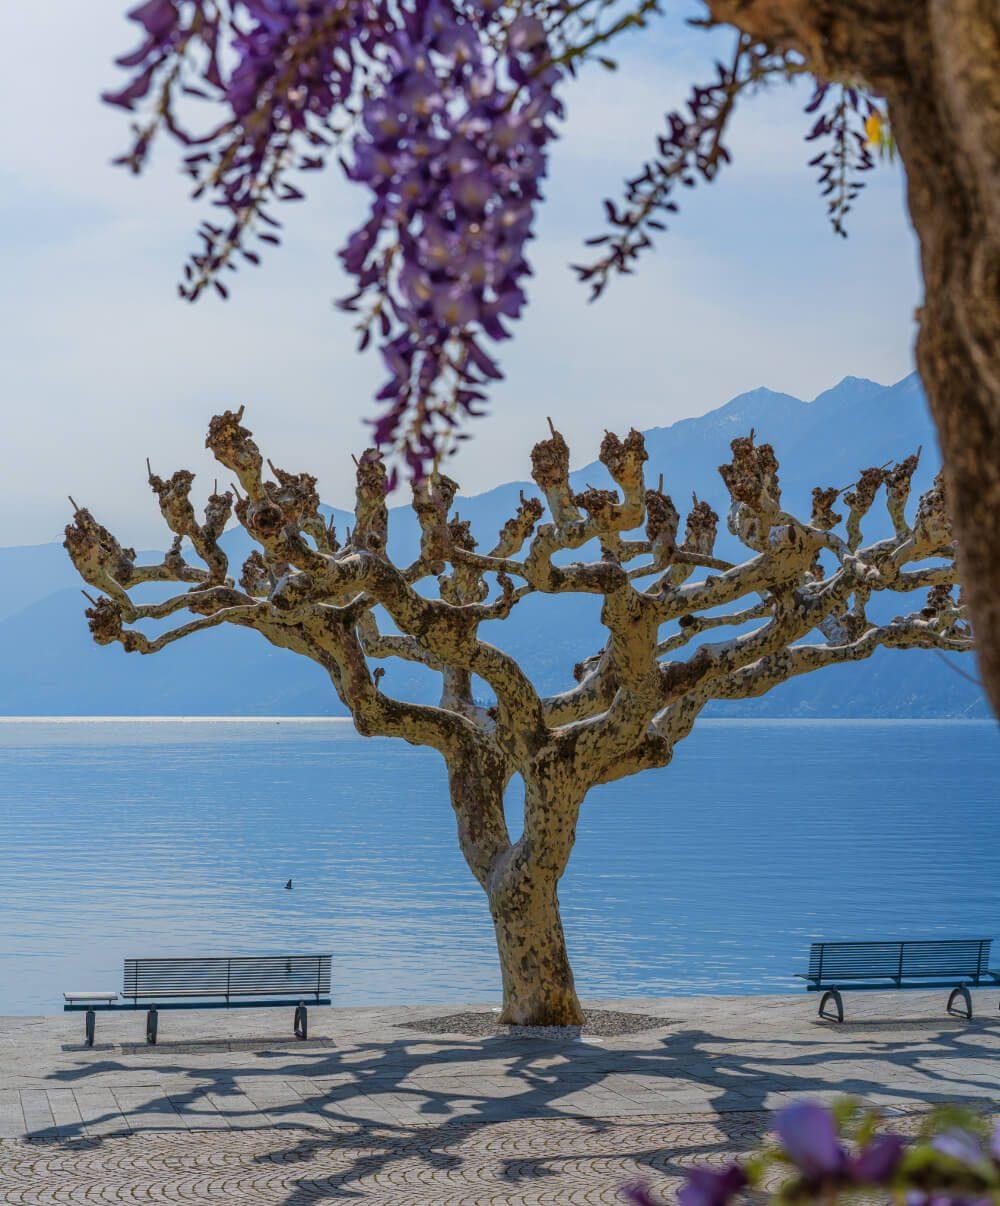 Der Frühling erwacht in Ascona-Locarno. (Bild: Ksenia Molina - shutterstock.com)